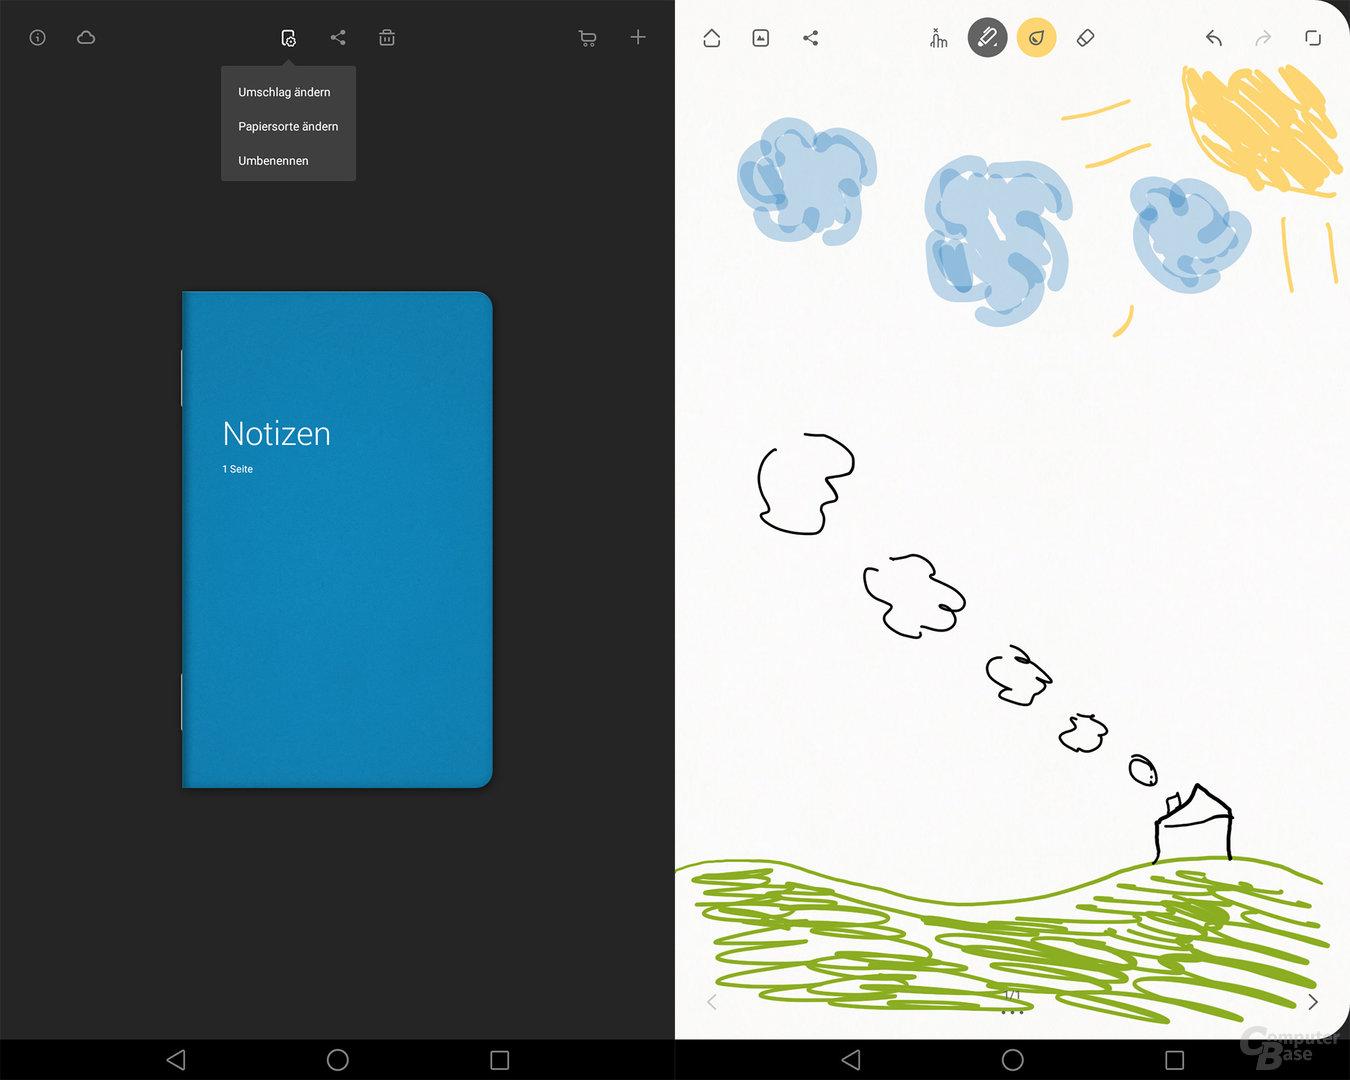 Notizfunktion des Huawei MediaPad M2 10.0